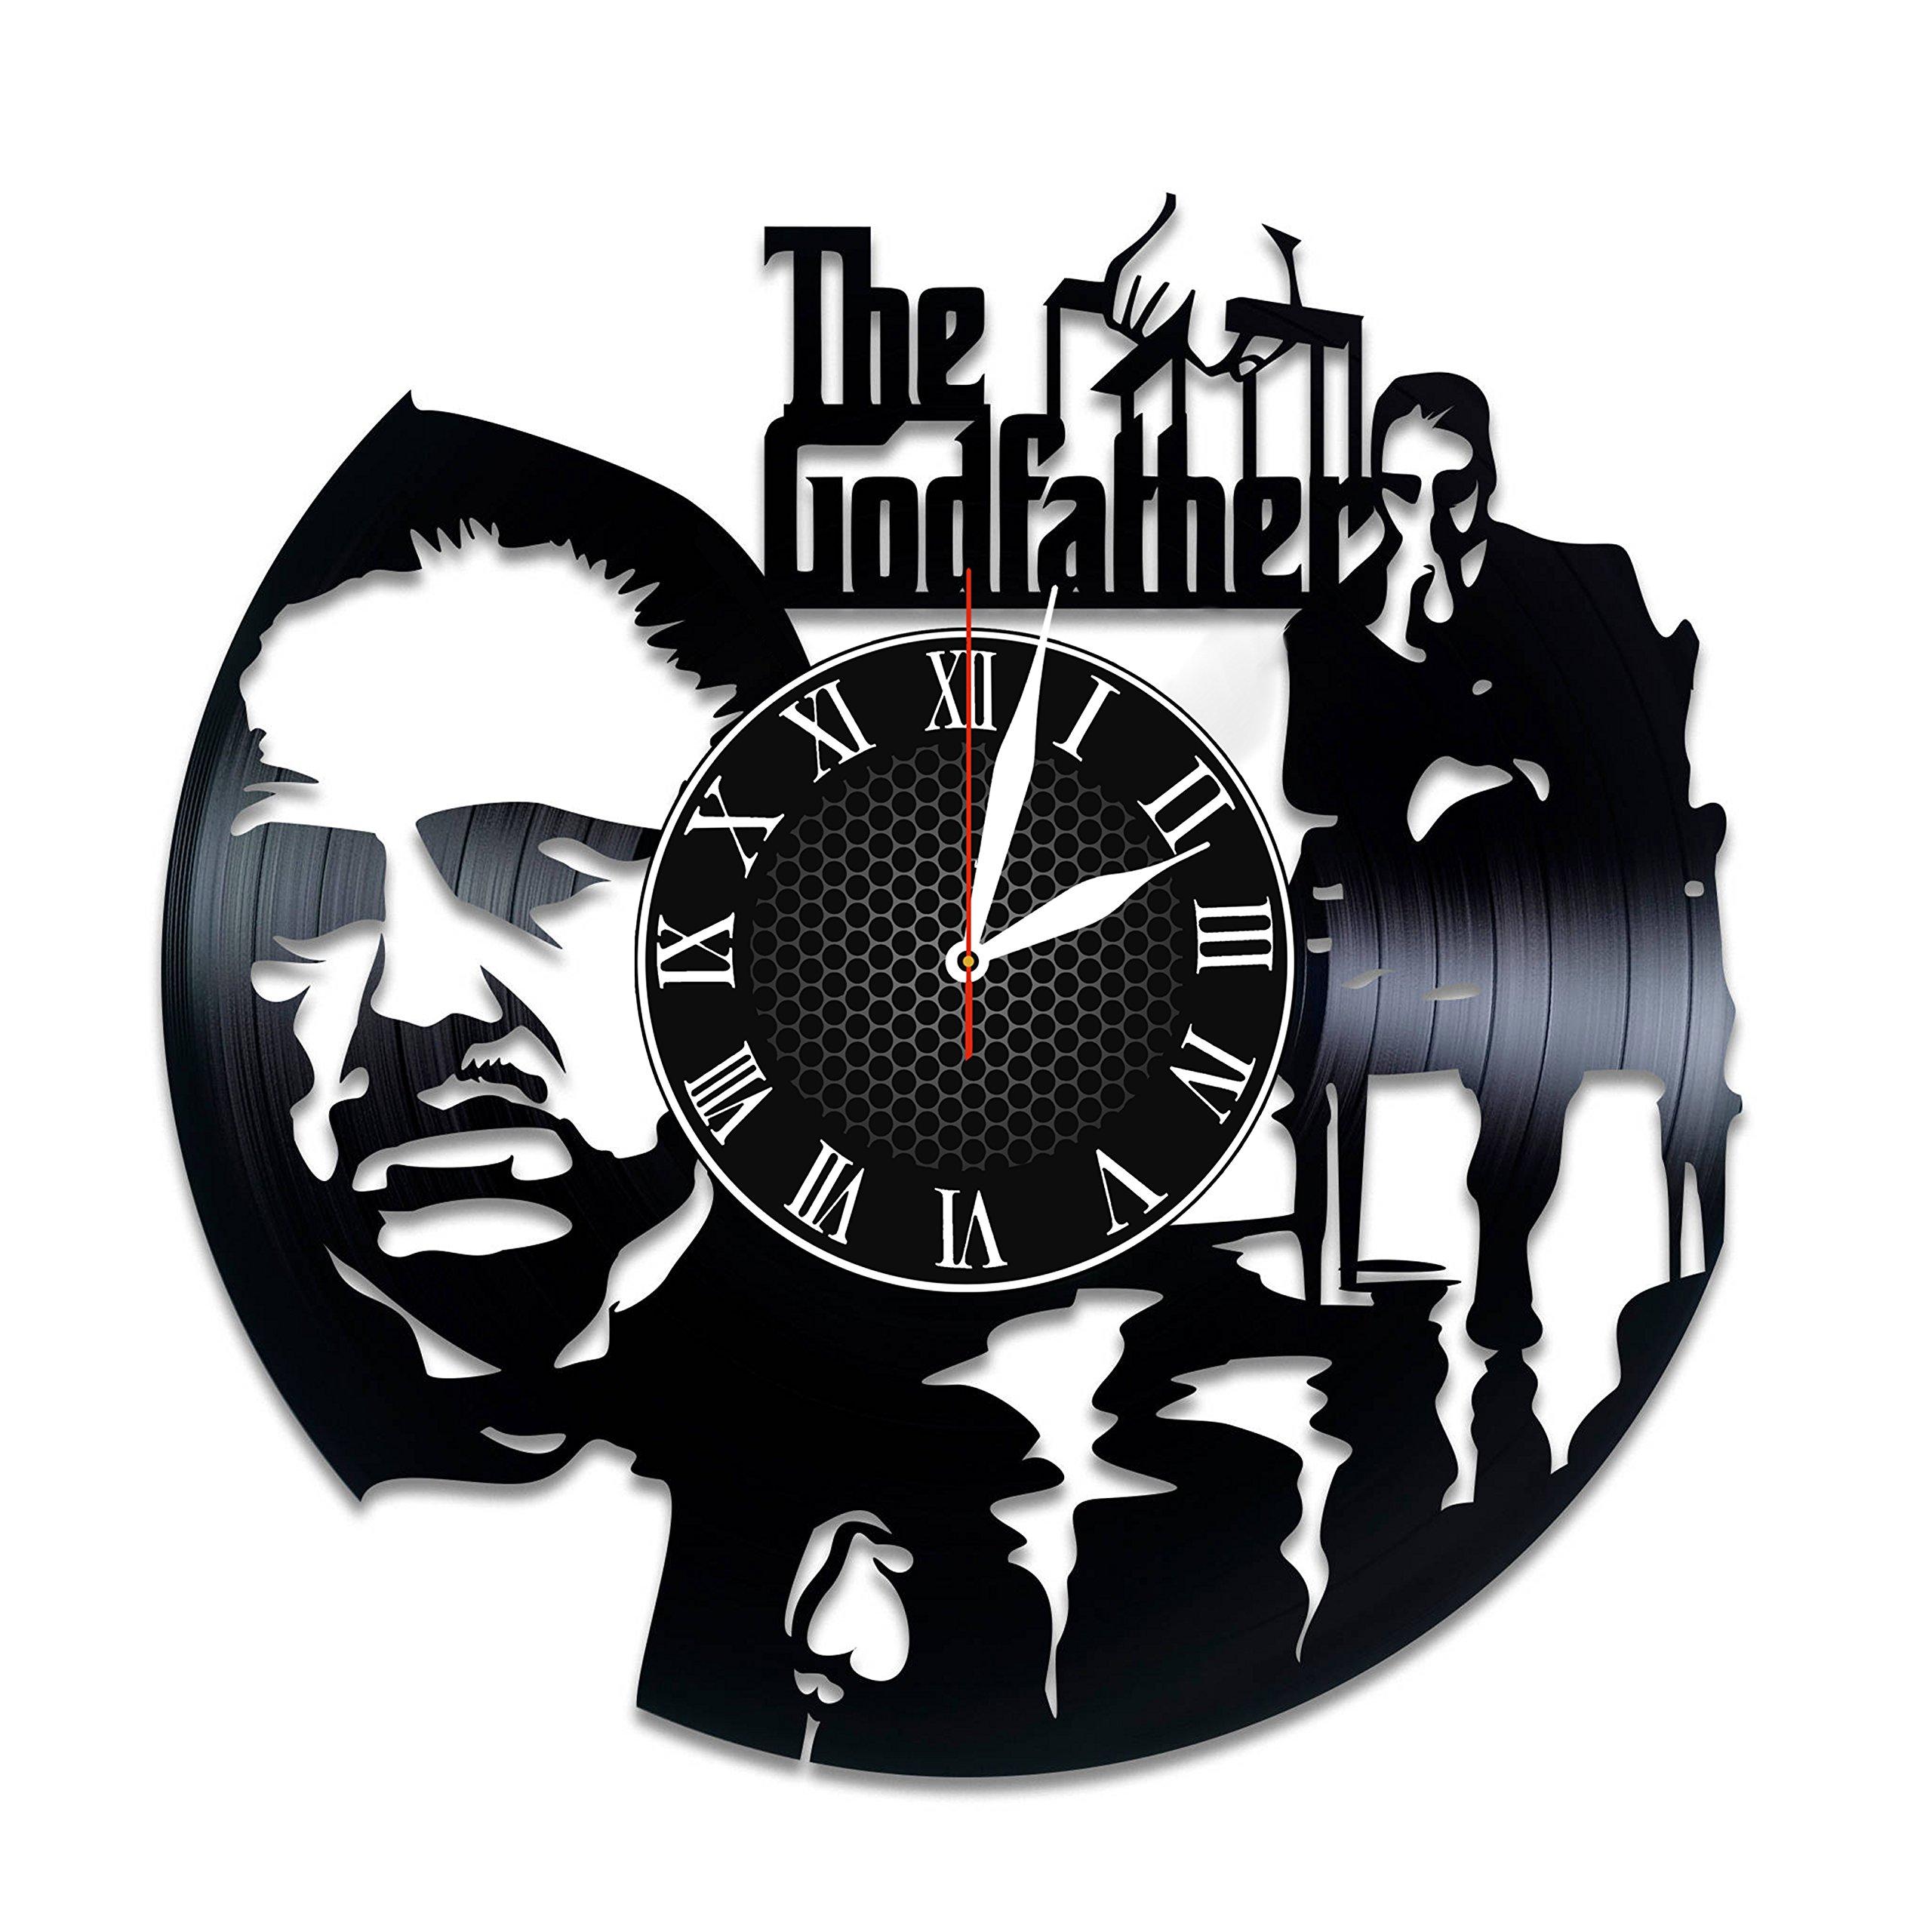 Olha Art Design The Godfather vinyl clock The Godfather wall decor The Godfather mafia The Godfather movie The Godfather videogame The Godfather fan gift